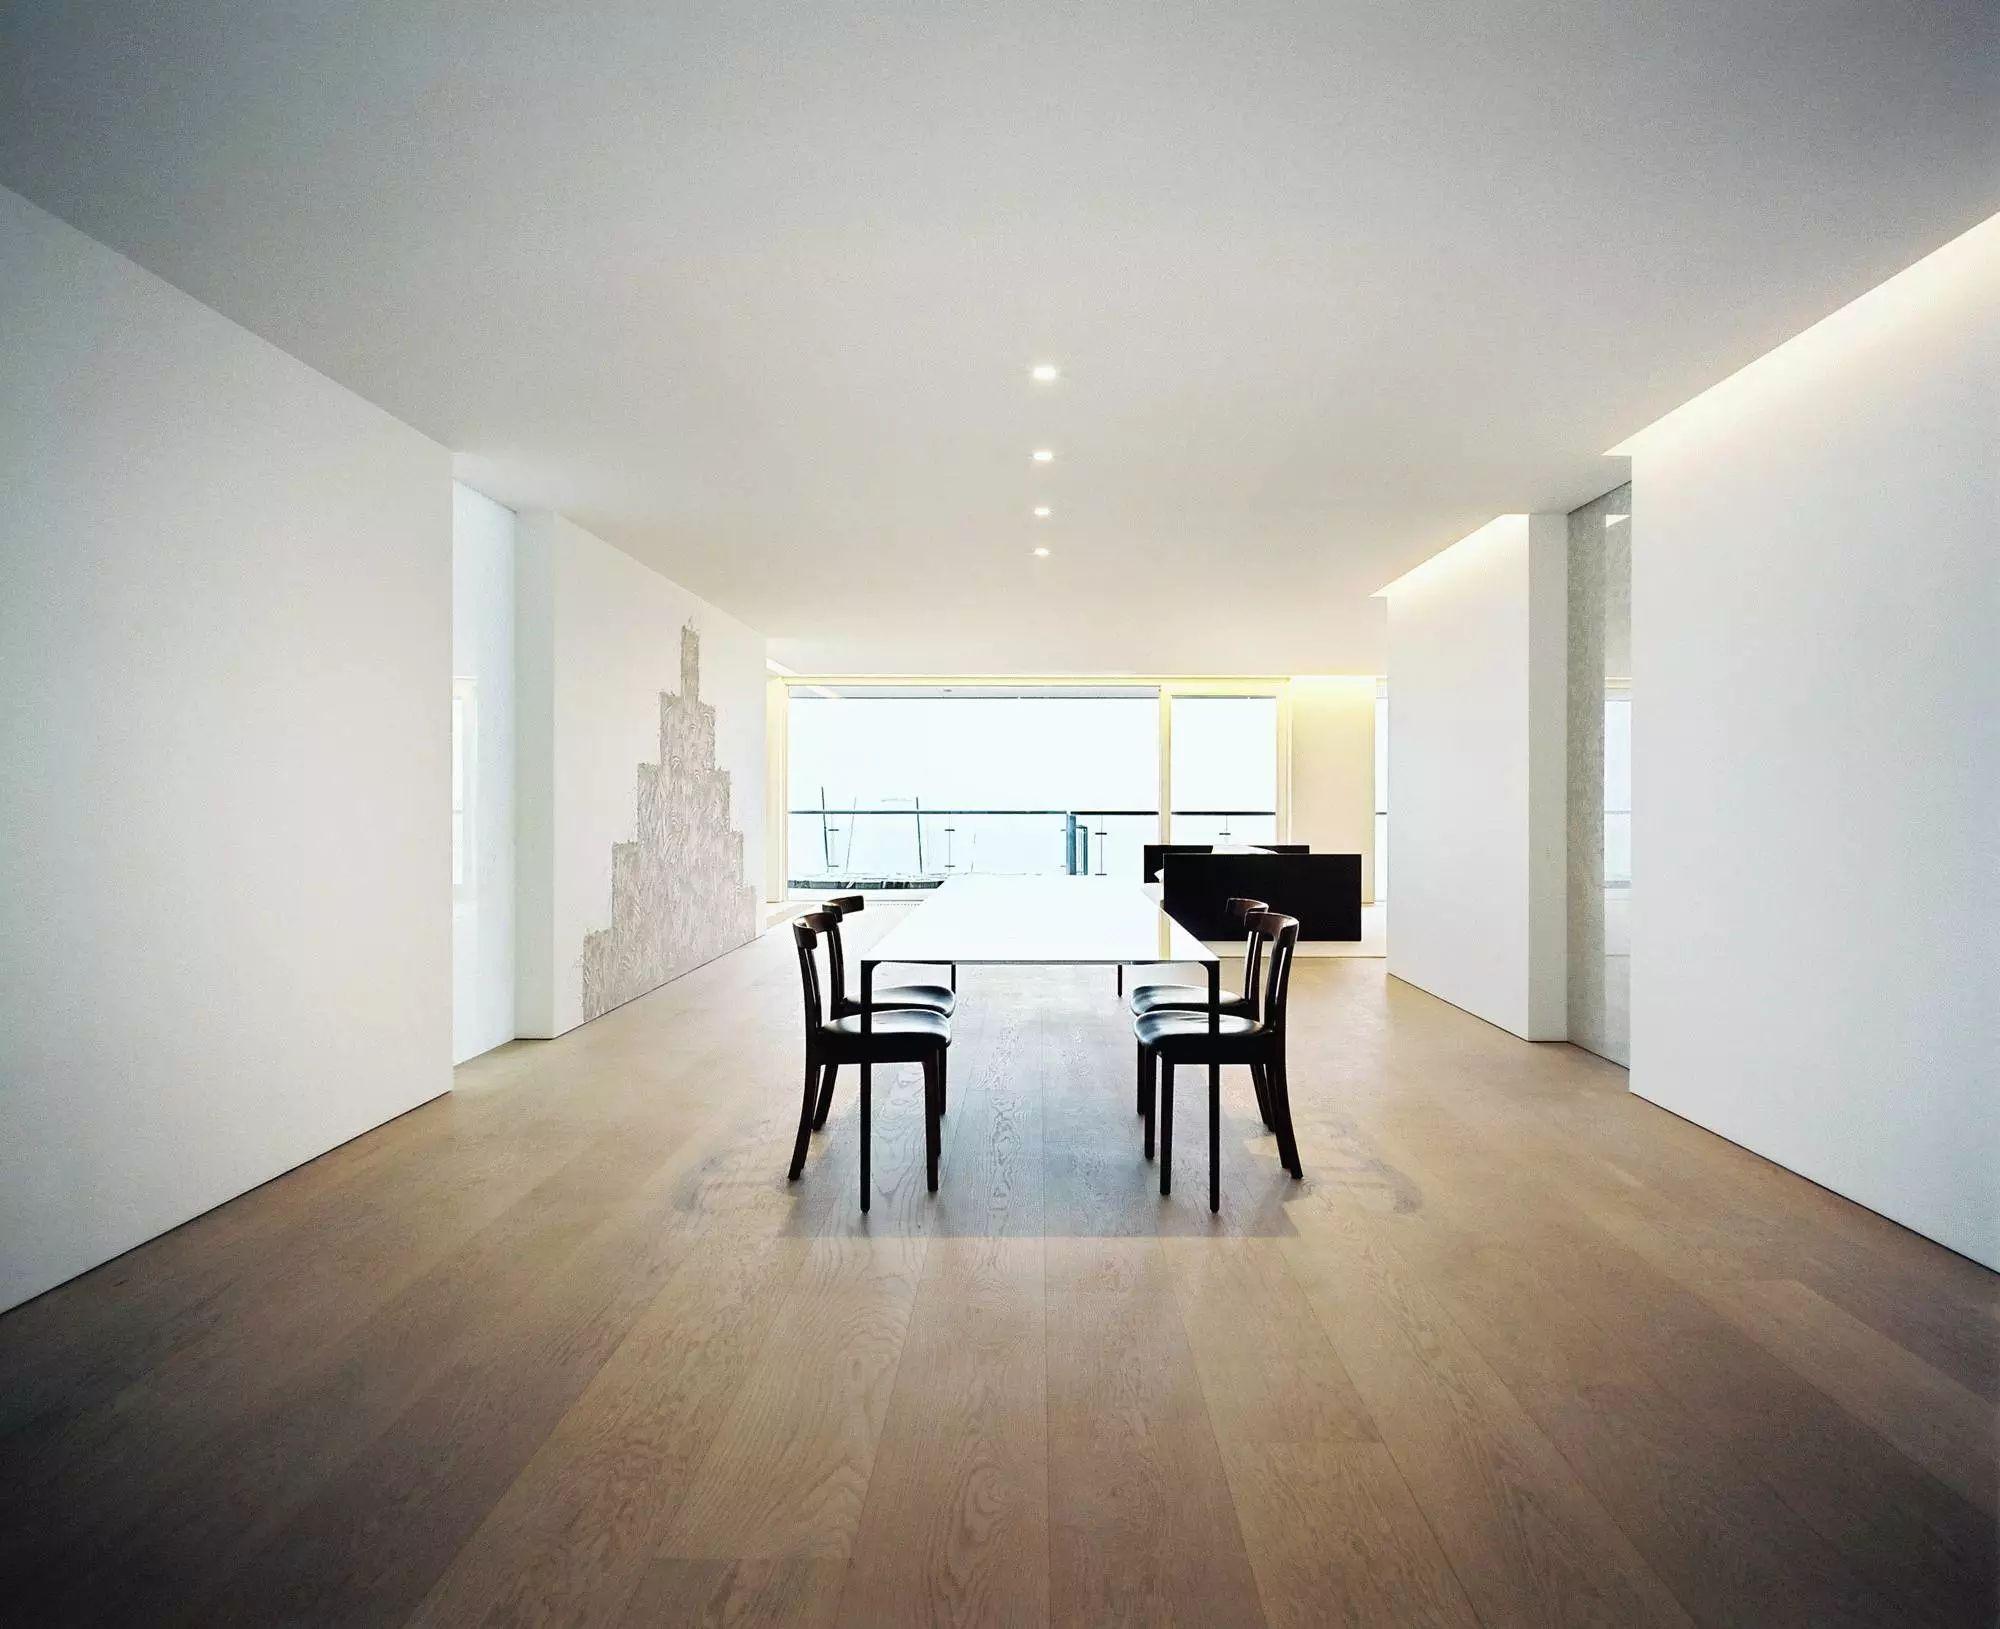 Httpdinesencomprojectbelgravia Residence - Minimalism - Pinterest - John Pawson, Plank And